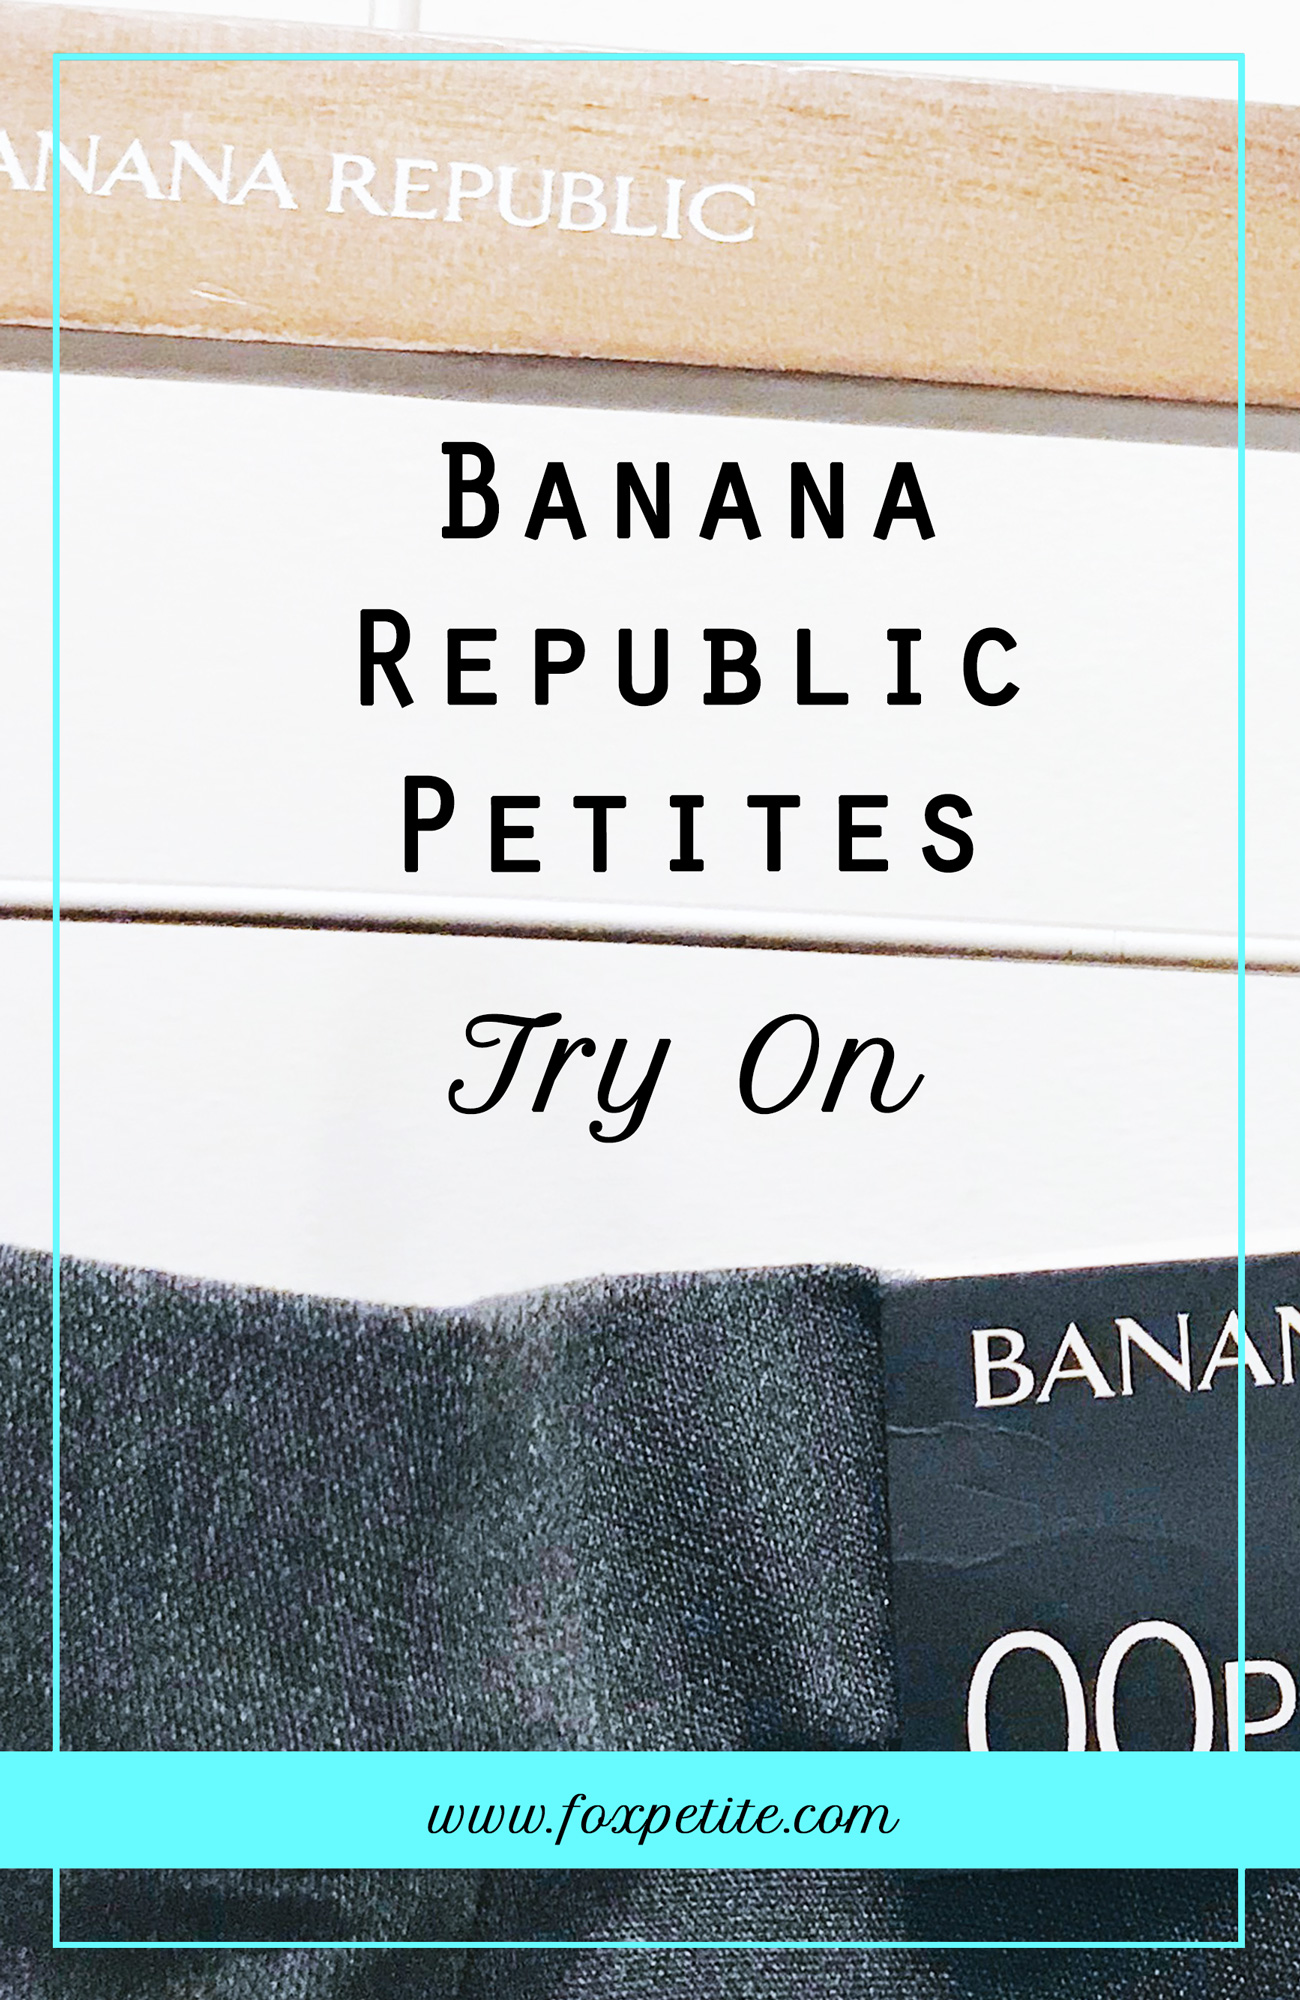 Banana Republic Petites try-on   blogger Fox Petite dressing room photos   #bananarepublic #tryon